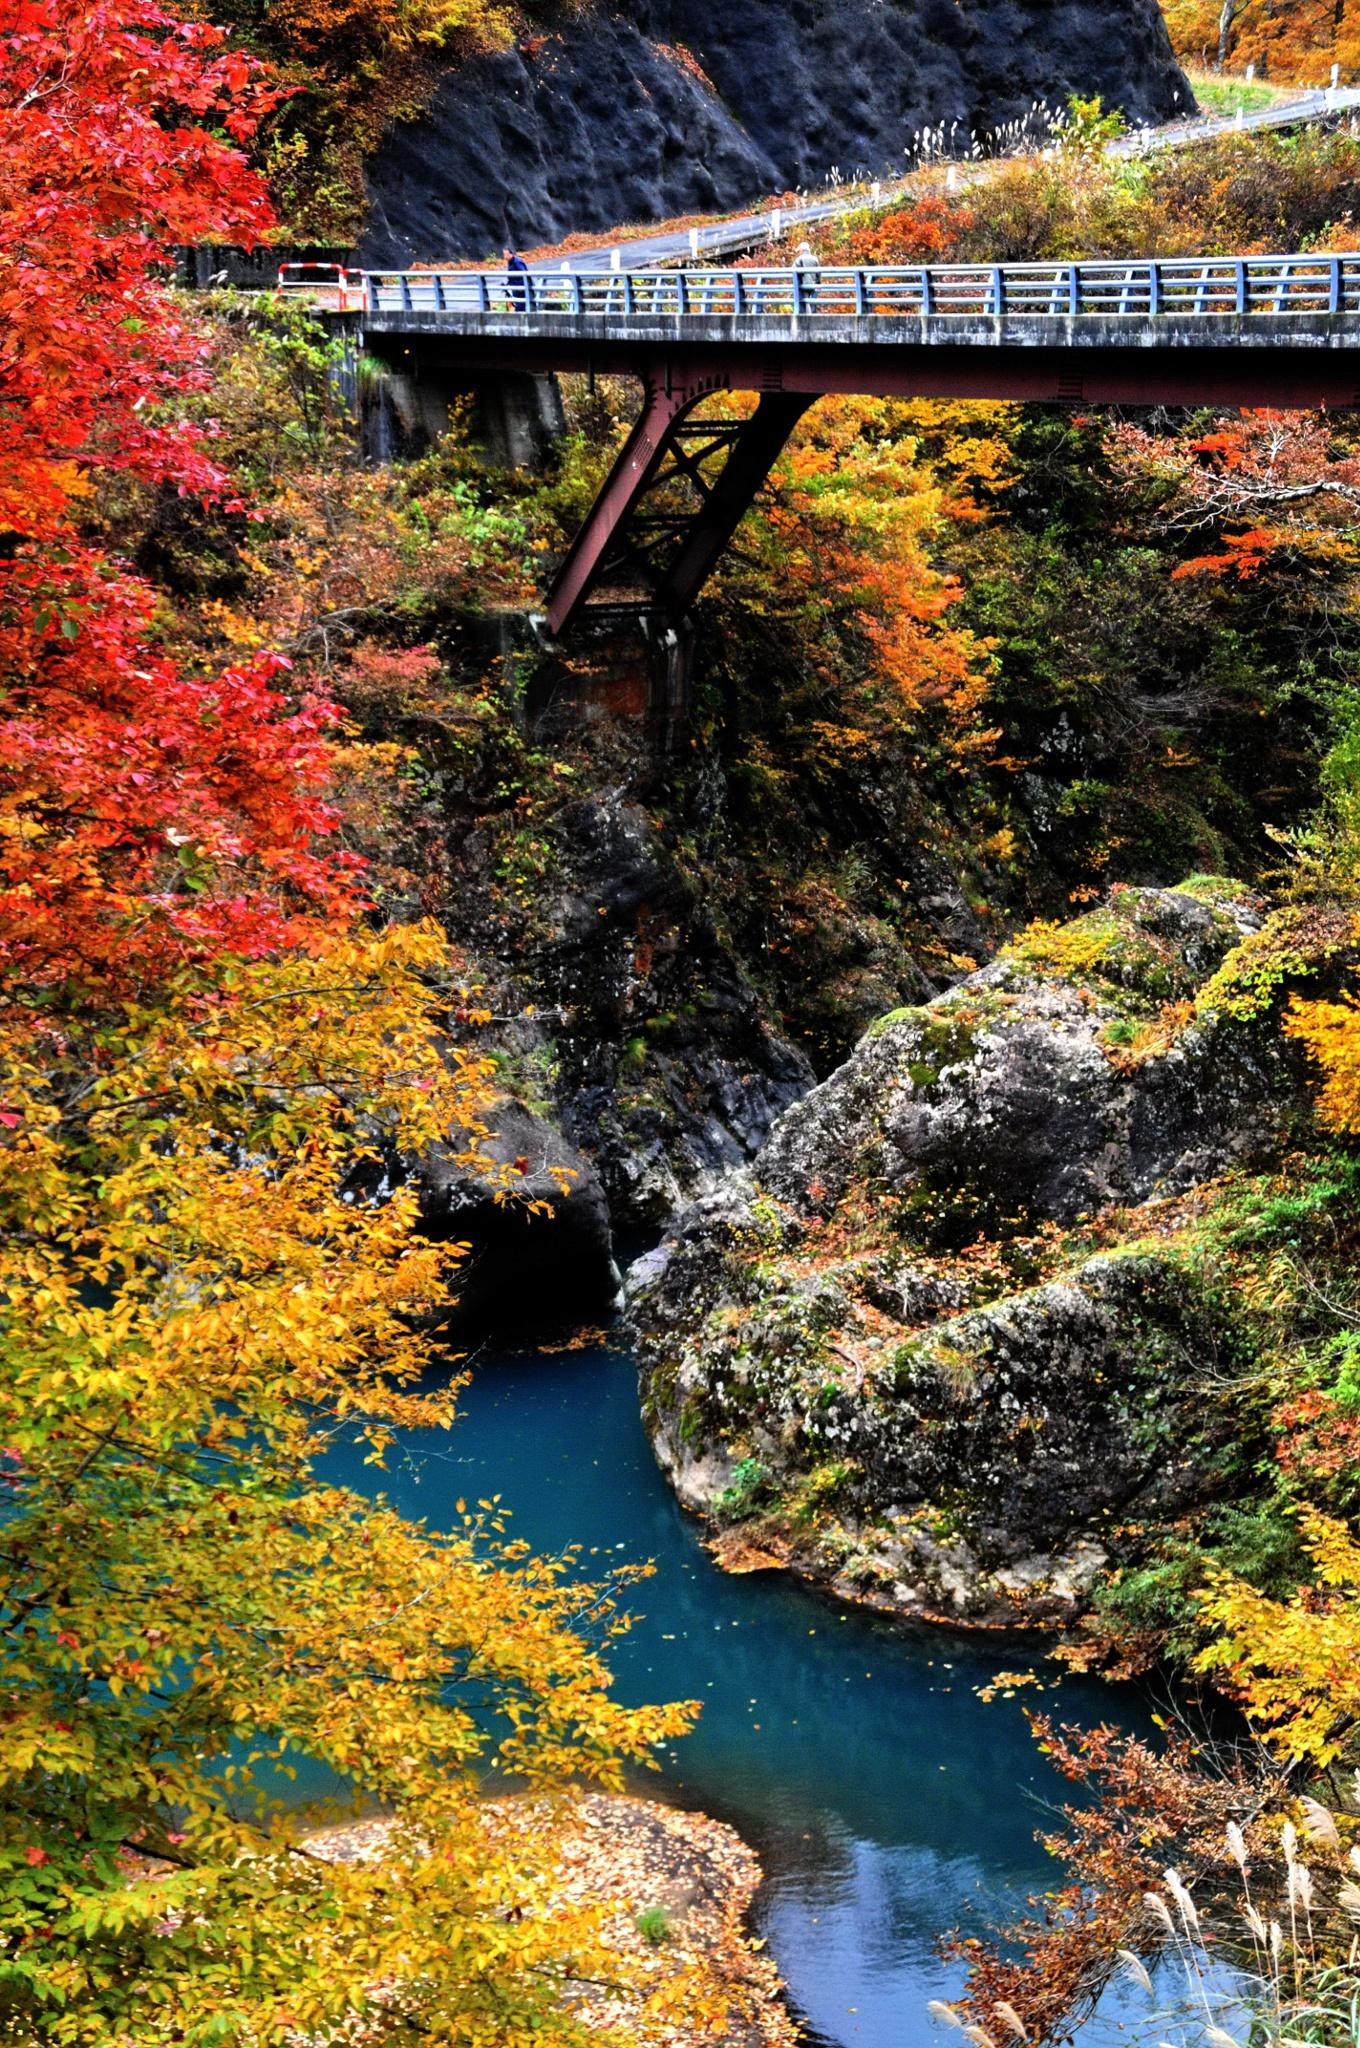 Bridge-in-Autumn-by-KEN-OHSAWA-on-px-wallpaper-wp3401712